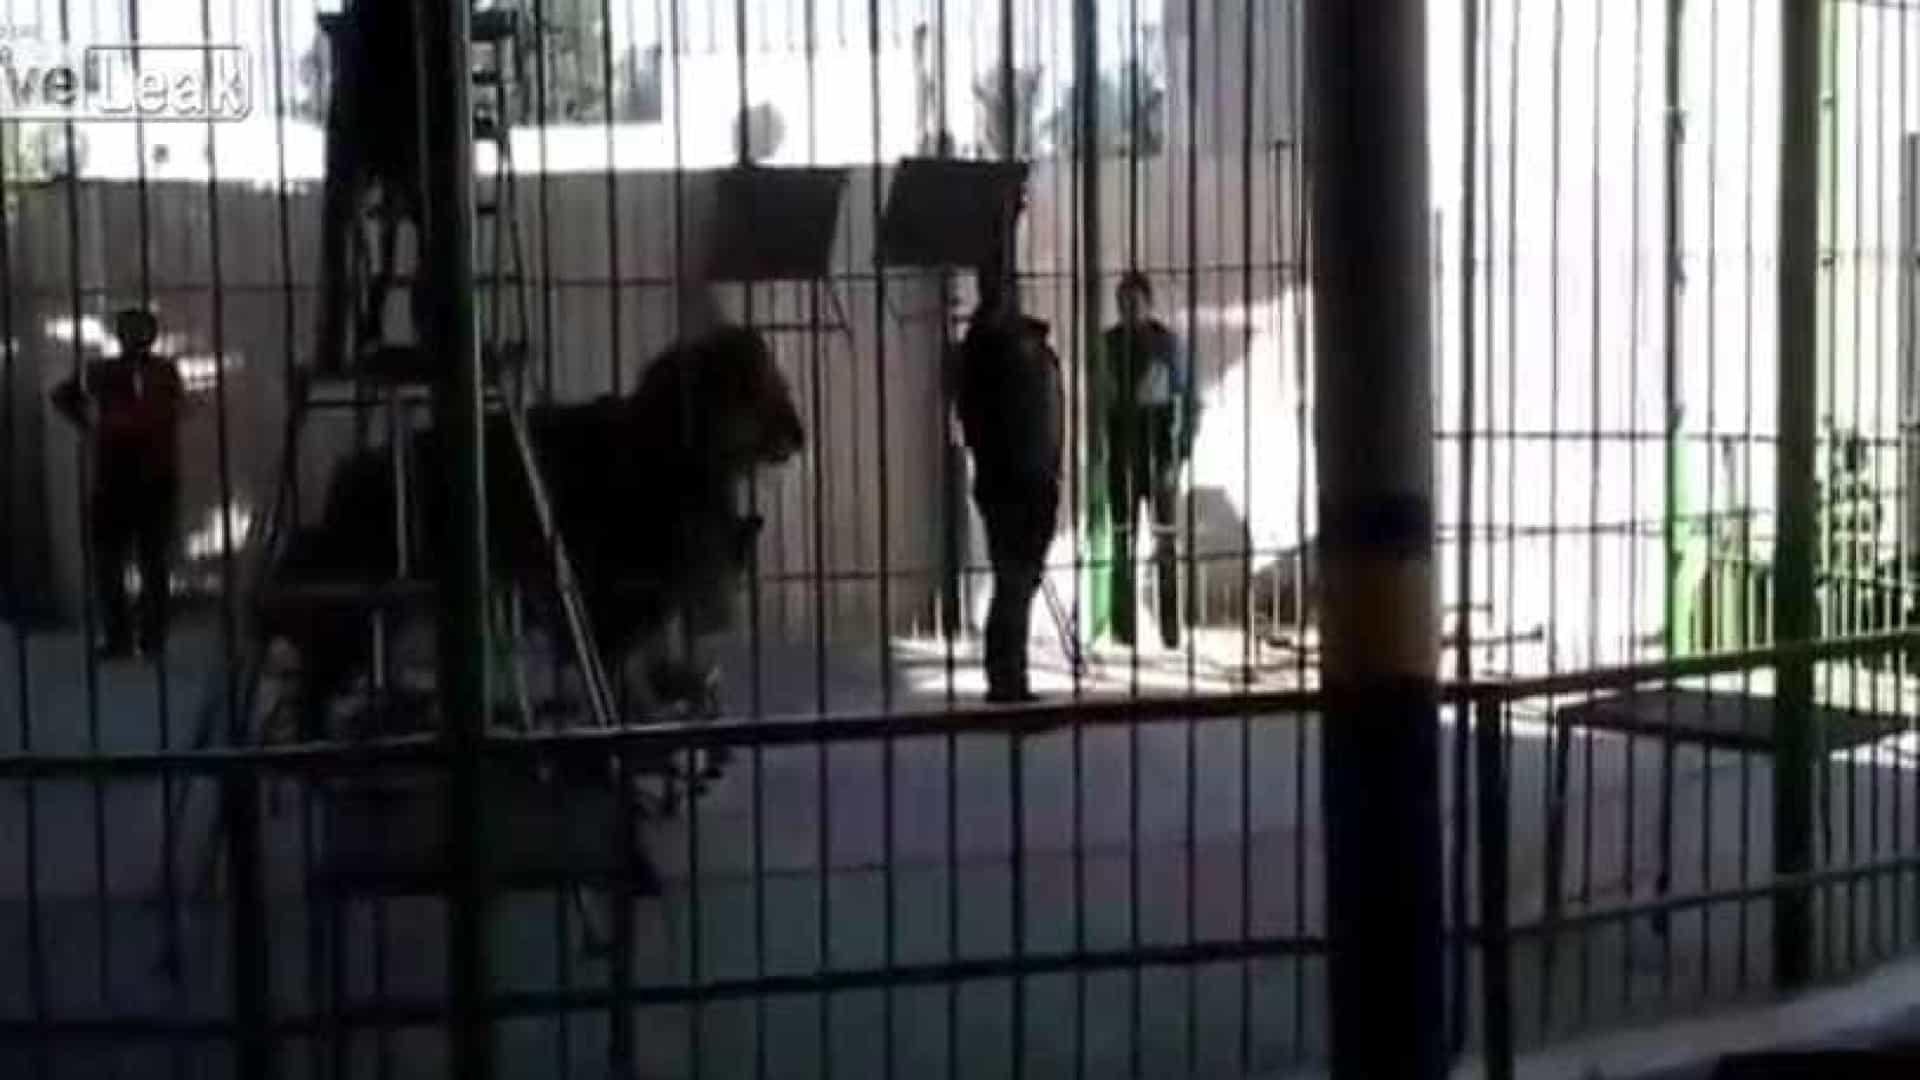 Leão ataca e mata domador durante espetáculo; vídeo